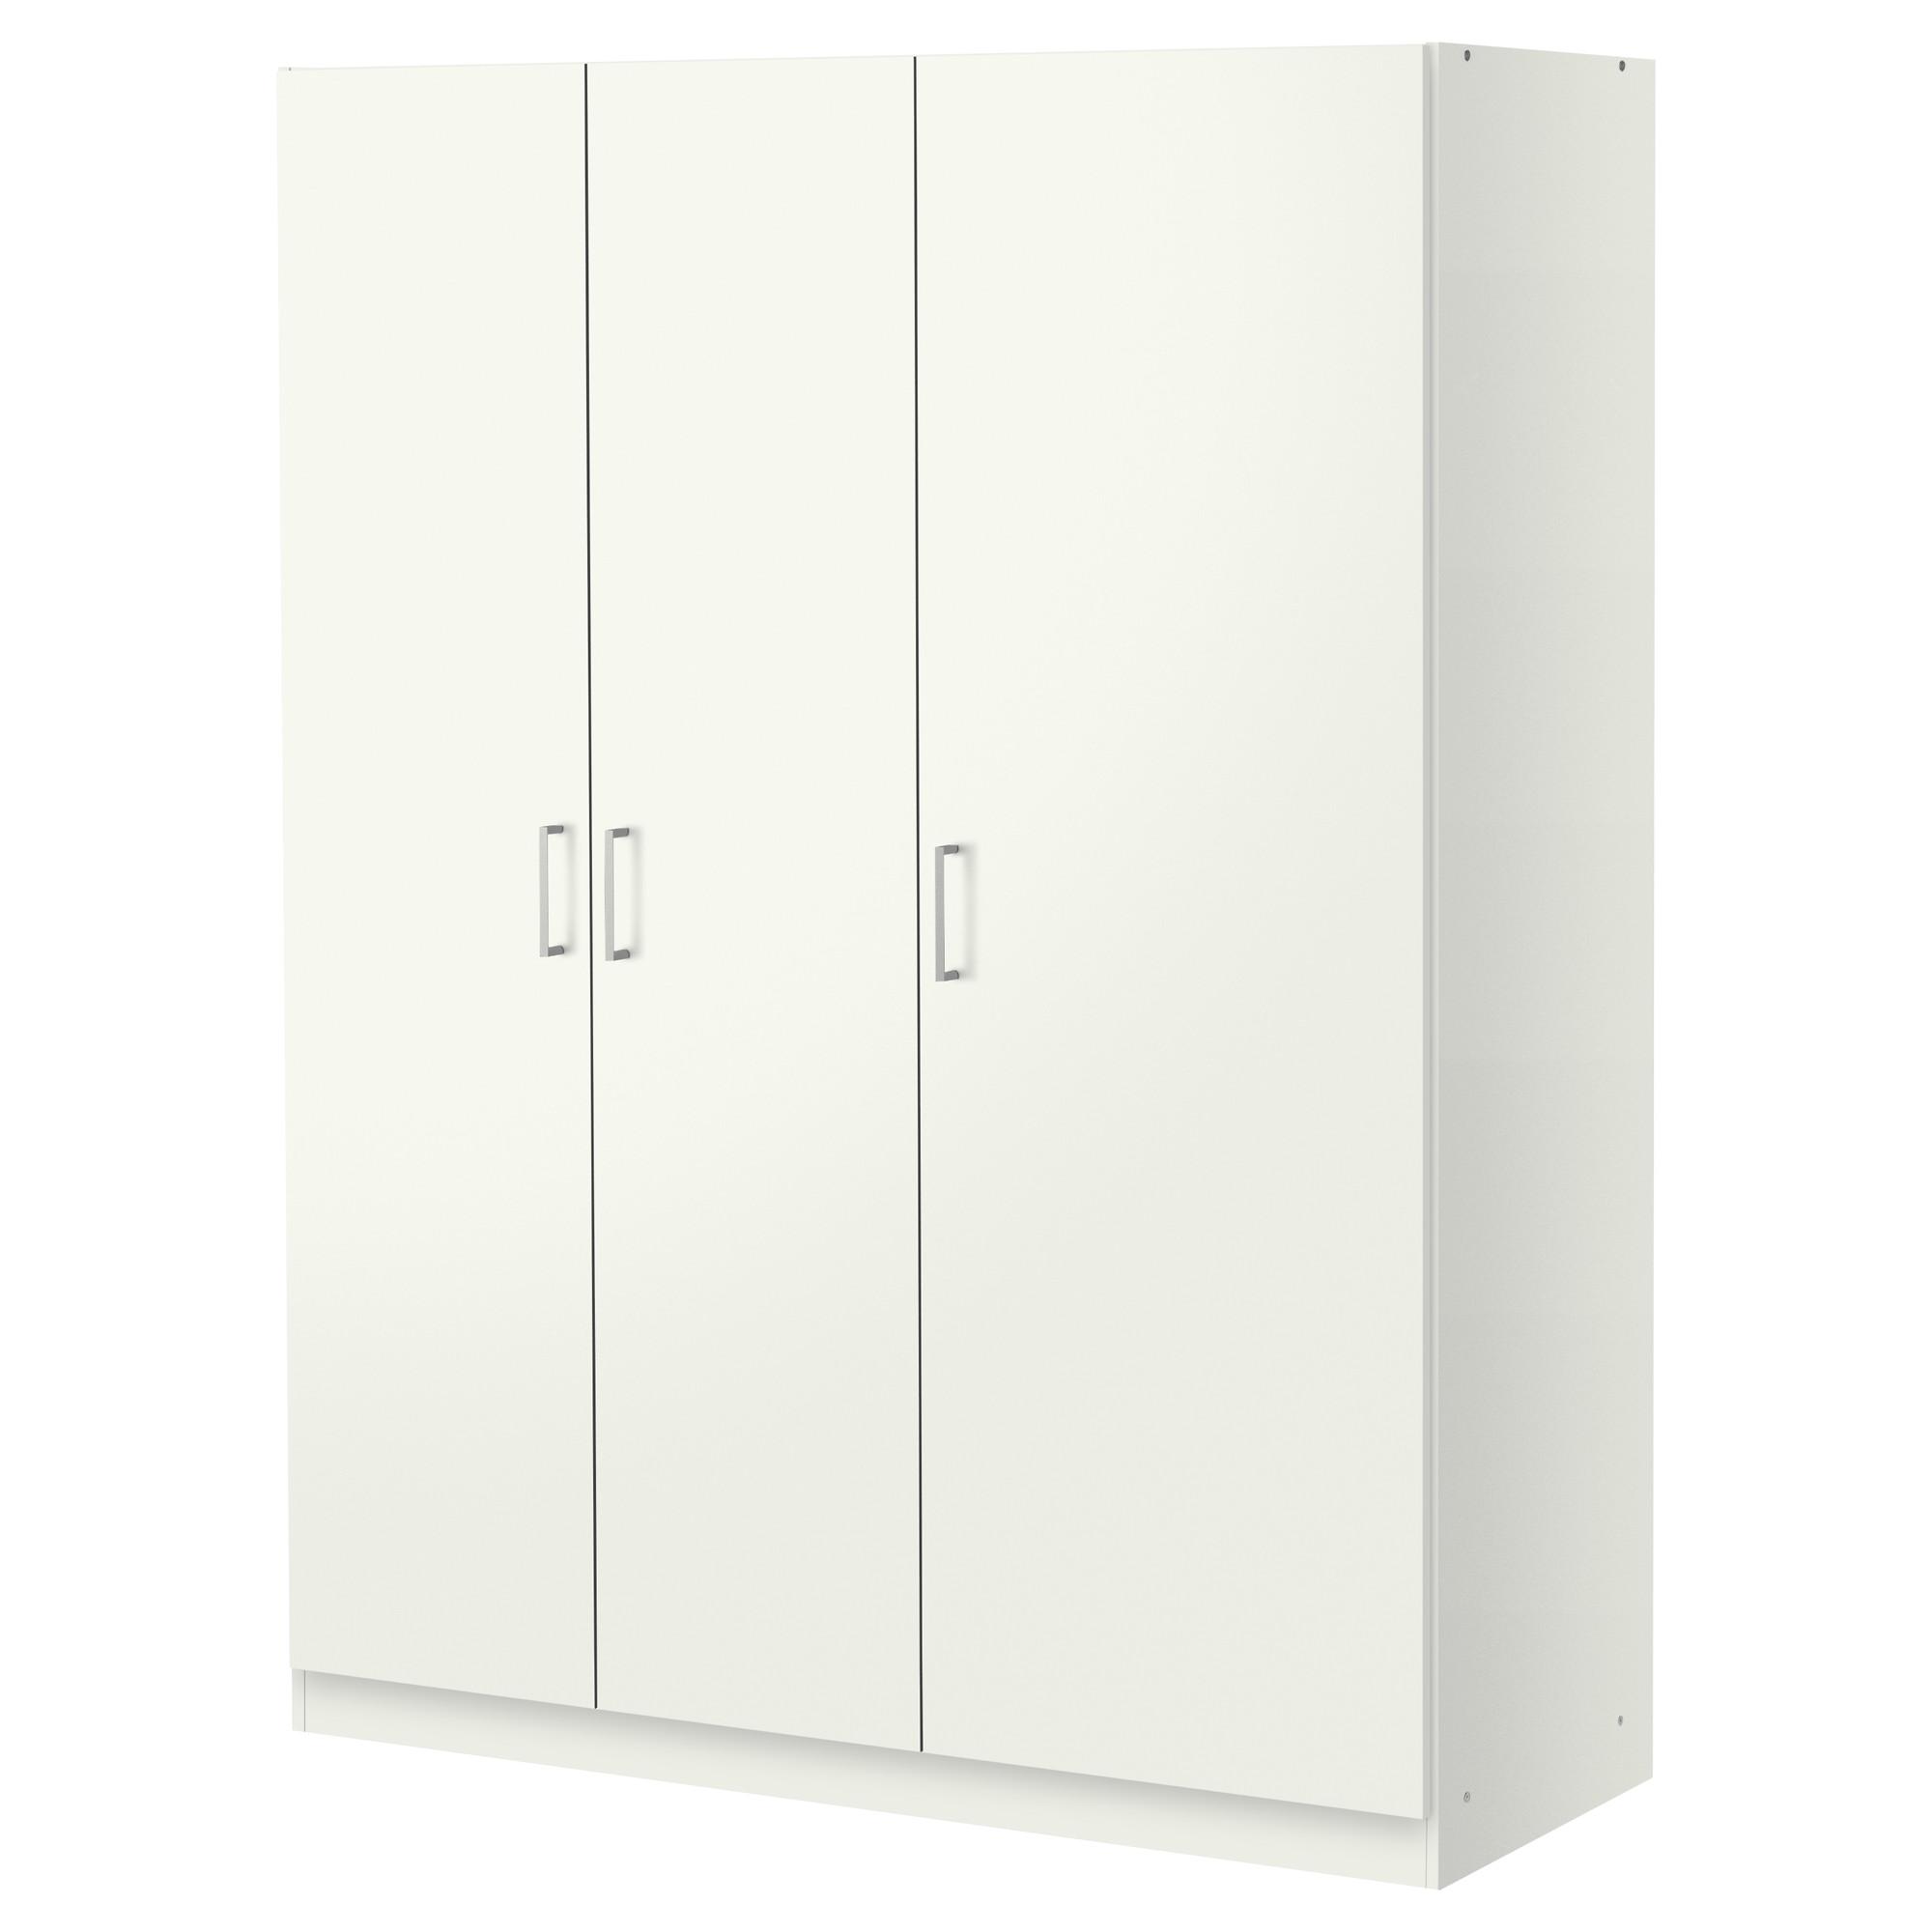 white wardrobes ikea dombås wardrobe adjustable shelves make it easy to customise the space KYQQLGI